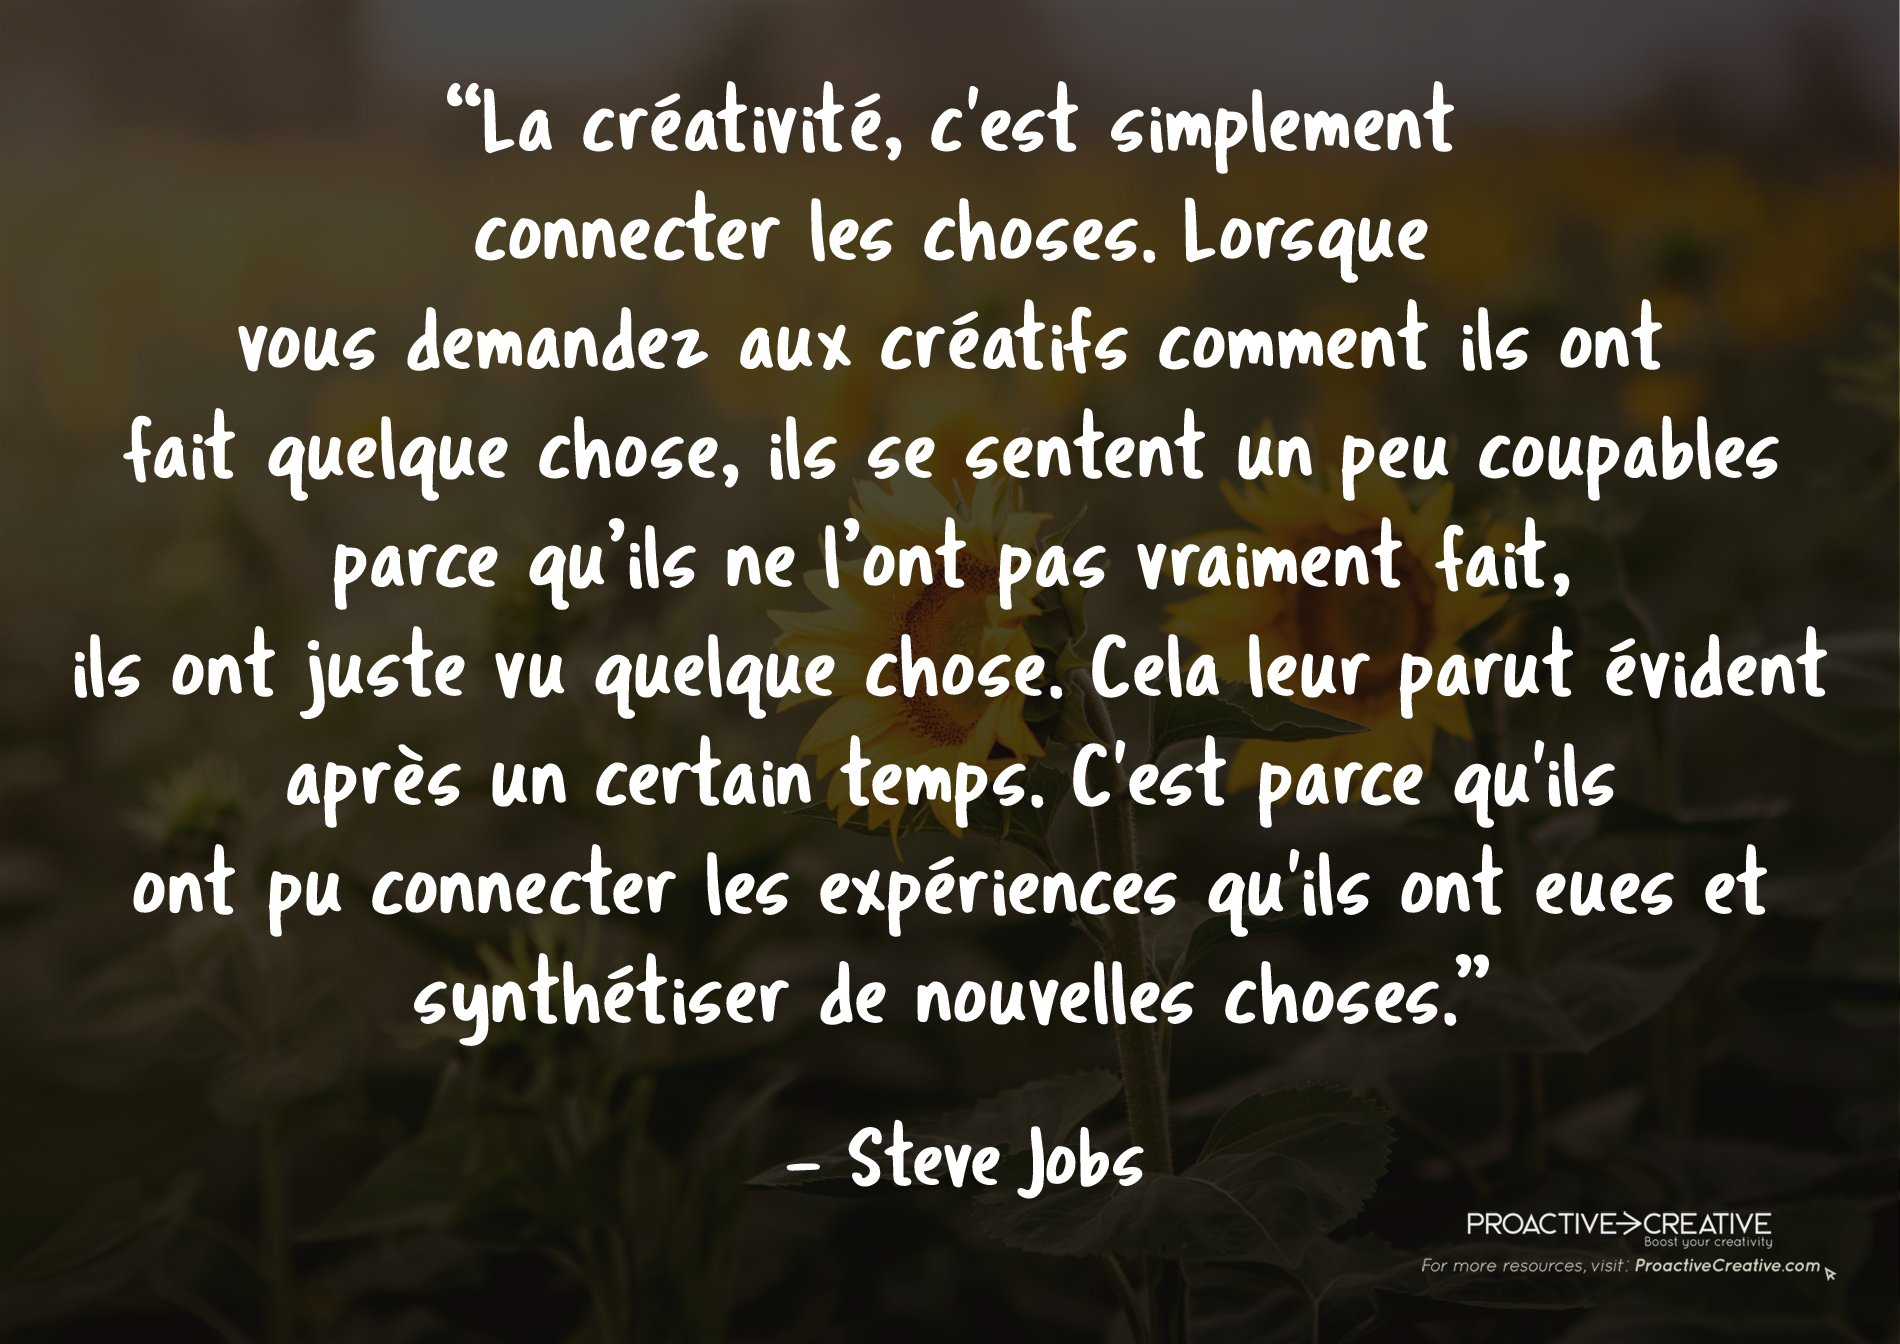 Citations motivantes - Steve Jobs